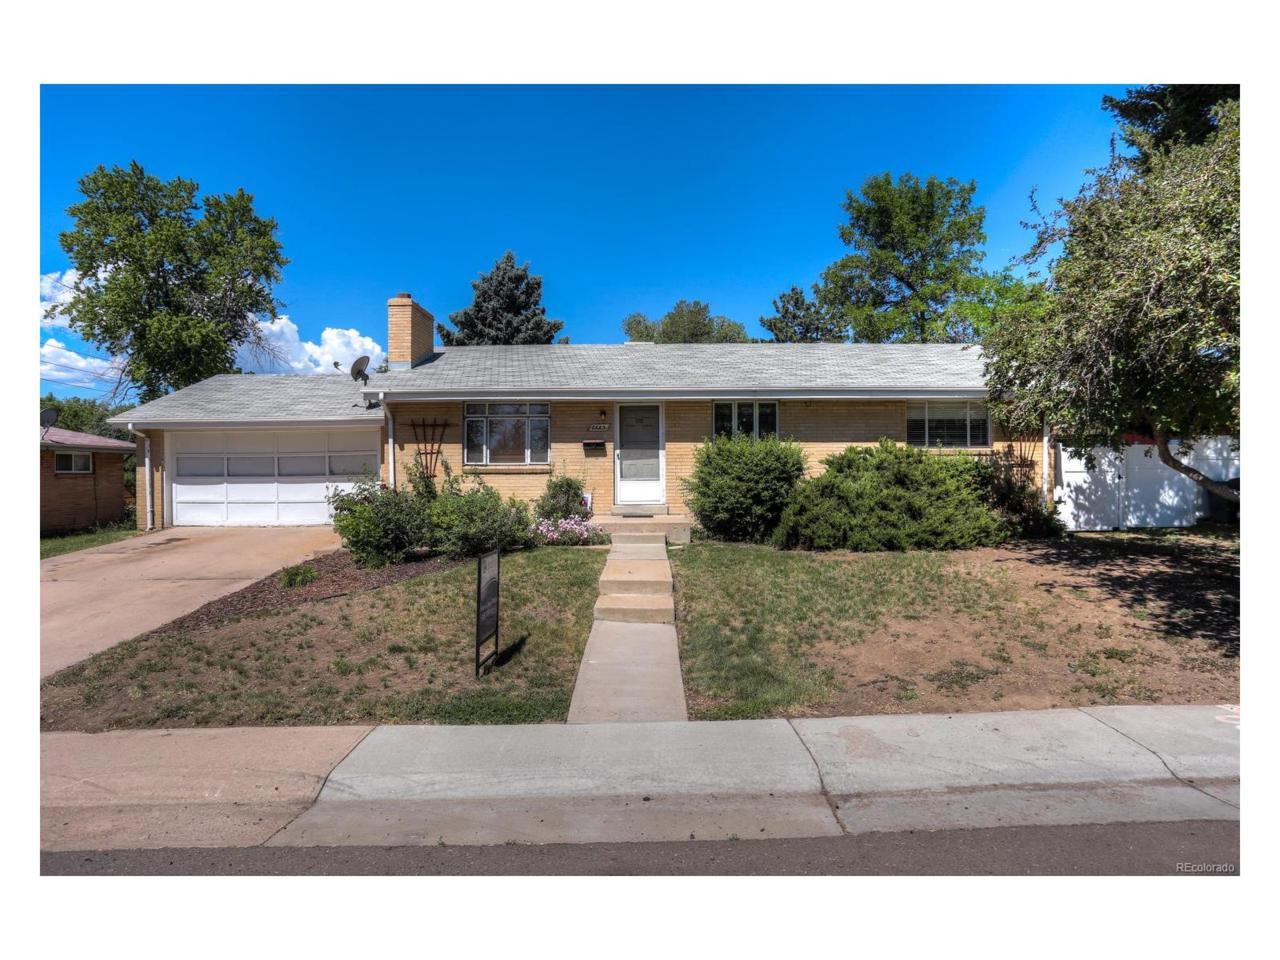 6683 S Grant Street, Centennial, CO 80121 (MLS #3004034) :: 8z Real Estate